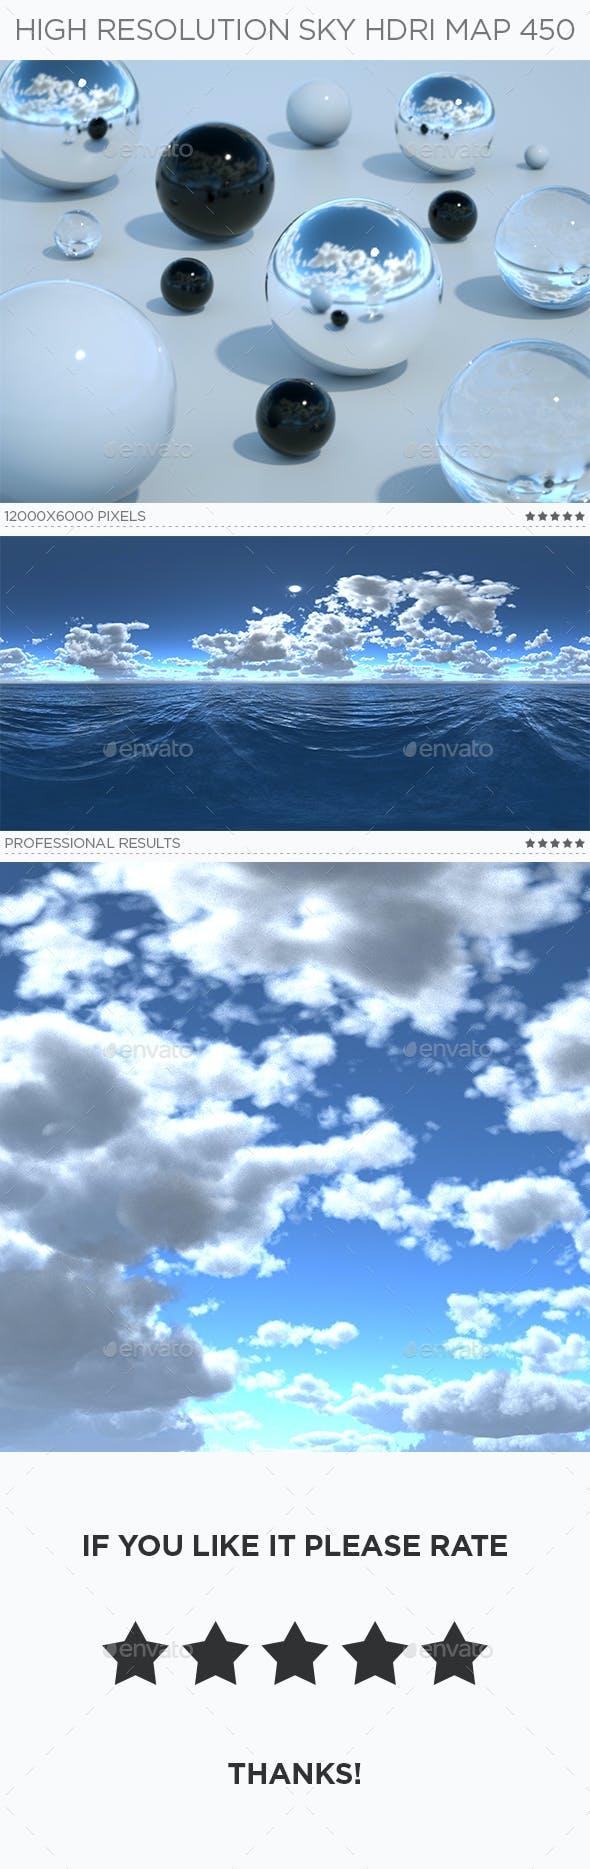 High Resolution Sky HDRi Map 450 - 3DOcean Item for Sale